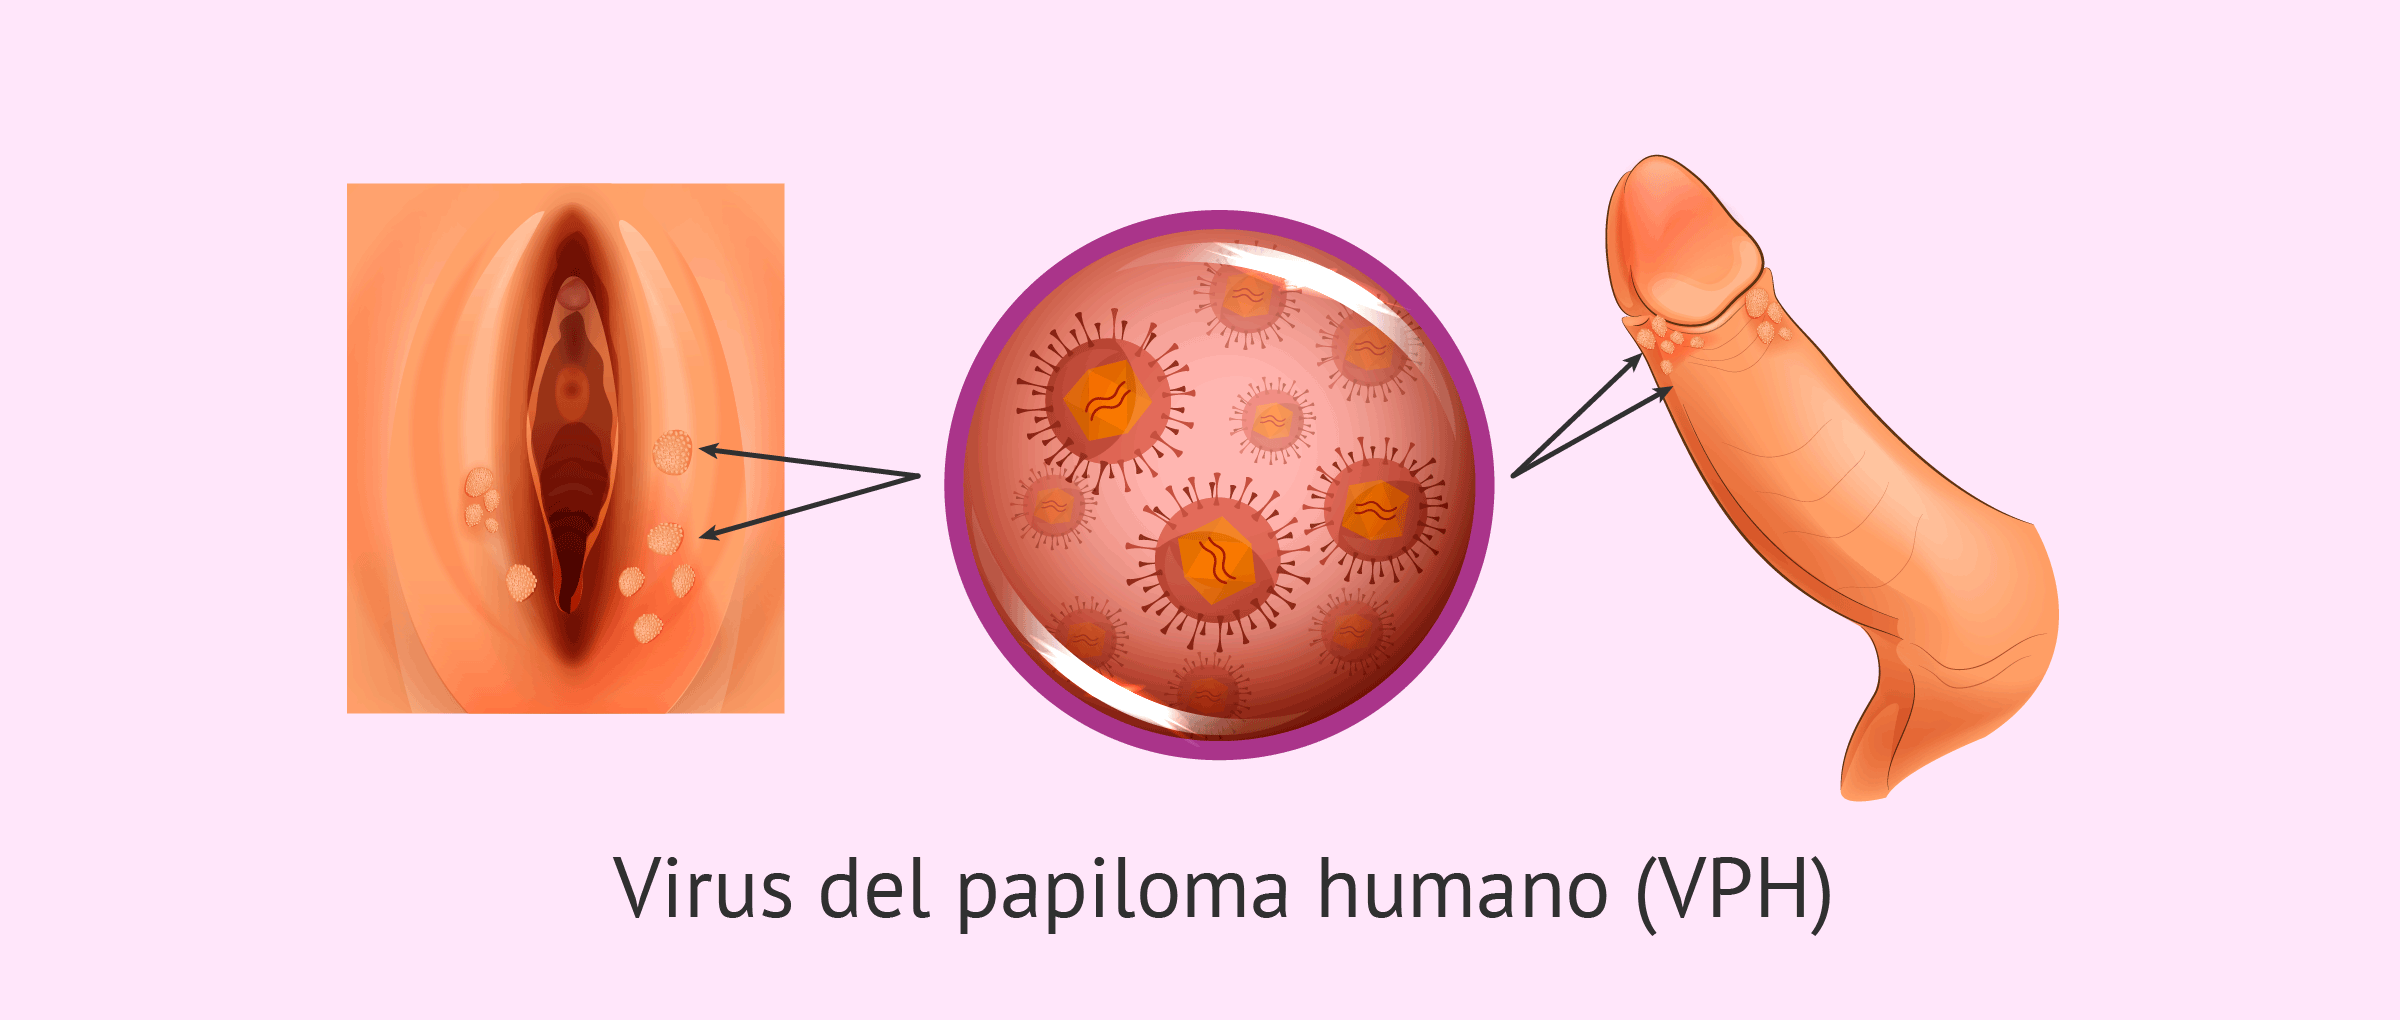 papiloma humano o vph classificazione anemie 4 gruppi